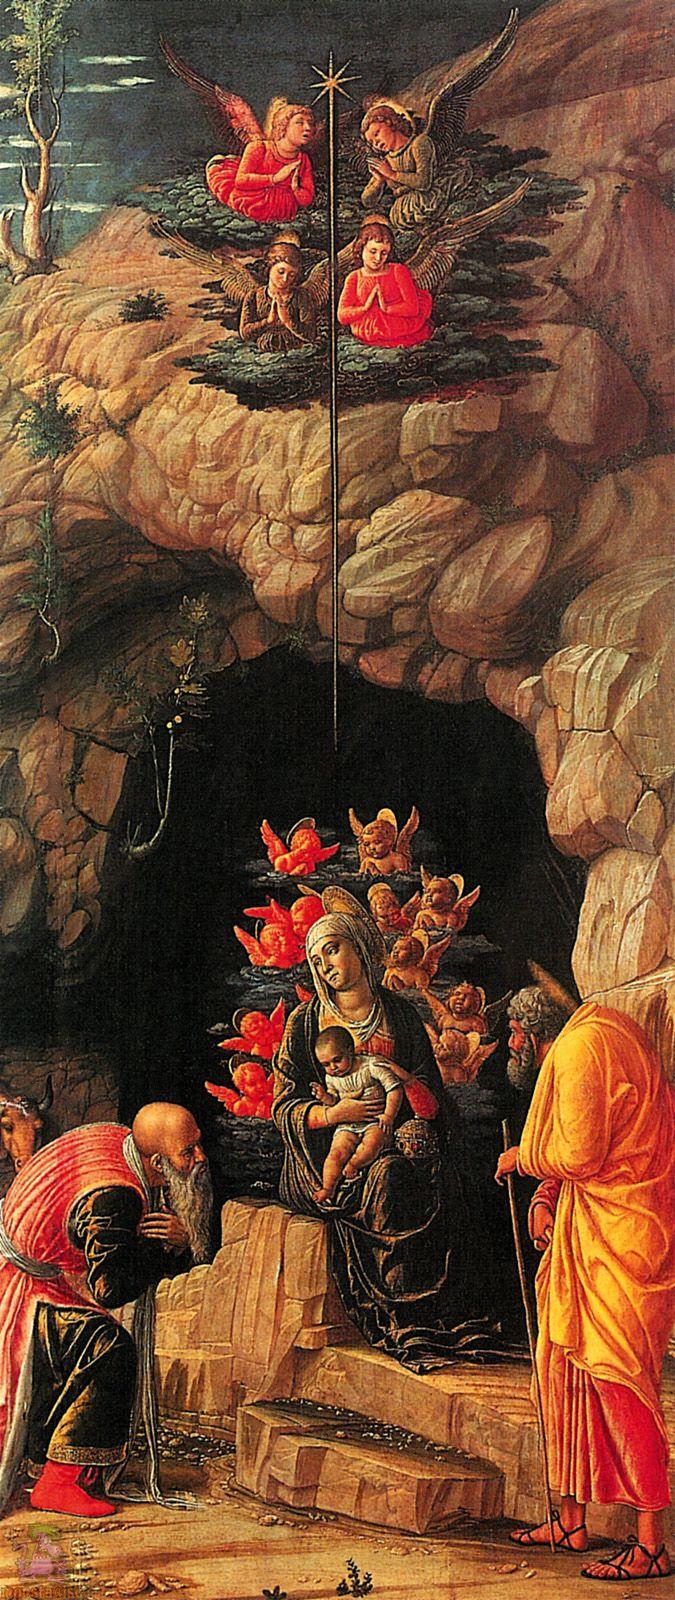 1460 - Adoration of the Magi - Andrea Mantegna